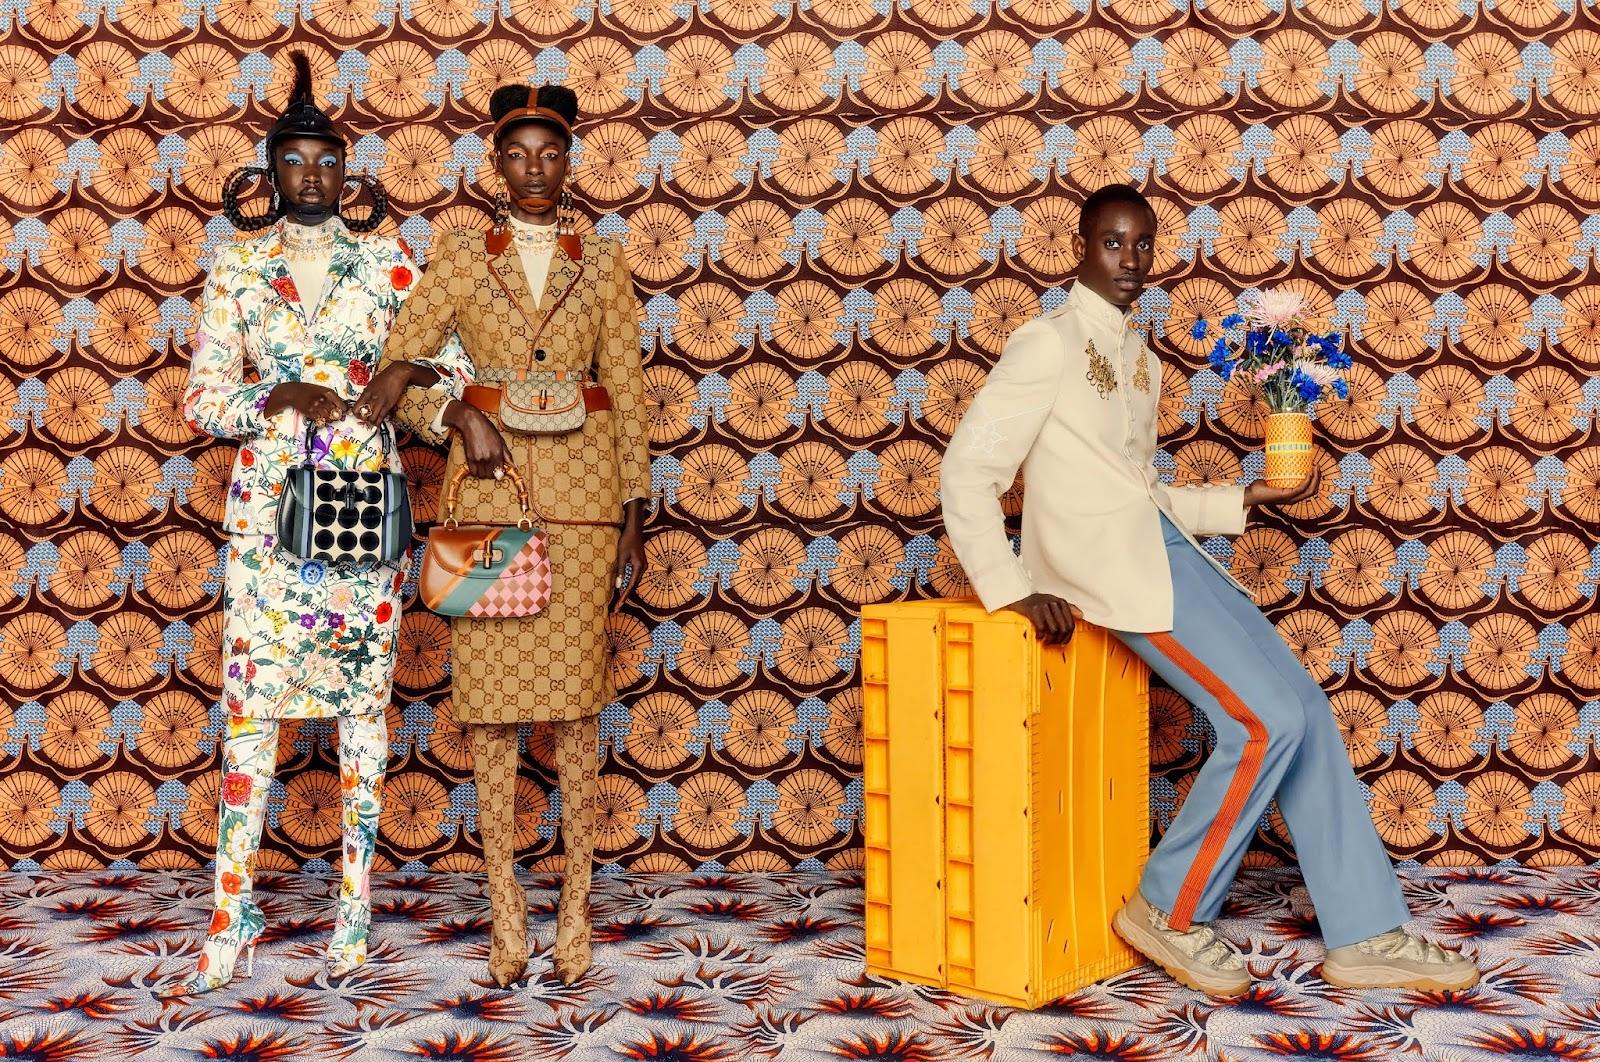 SMILE: Adhel Bol, Shade Akinbobola, & Charles Oduro in Elle UK October 2021 by Leonce Raphael Agbodjelou